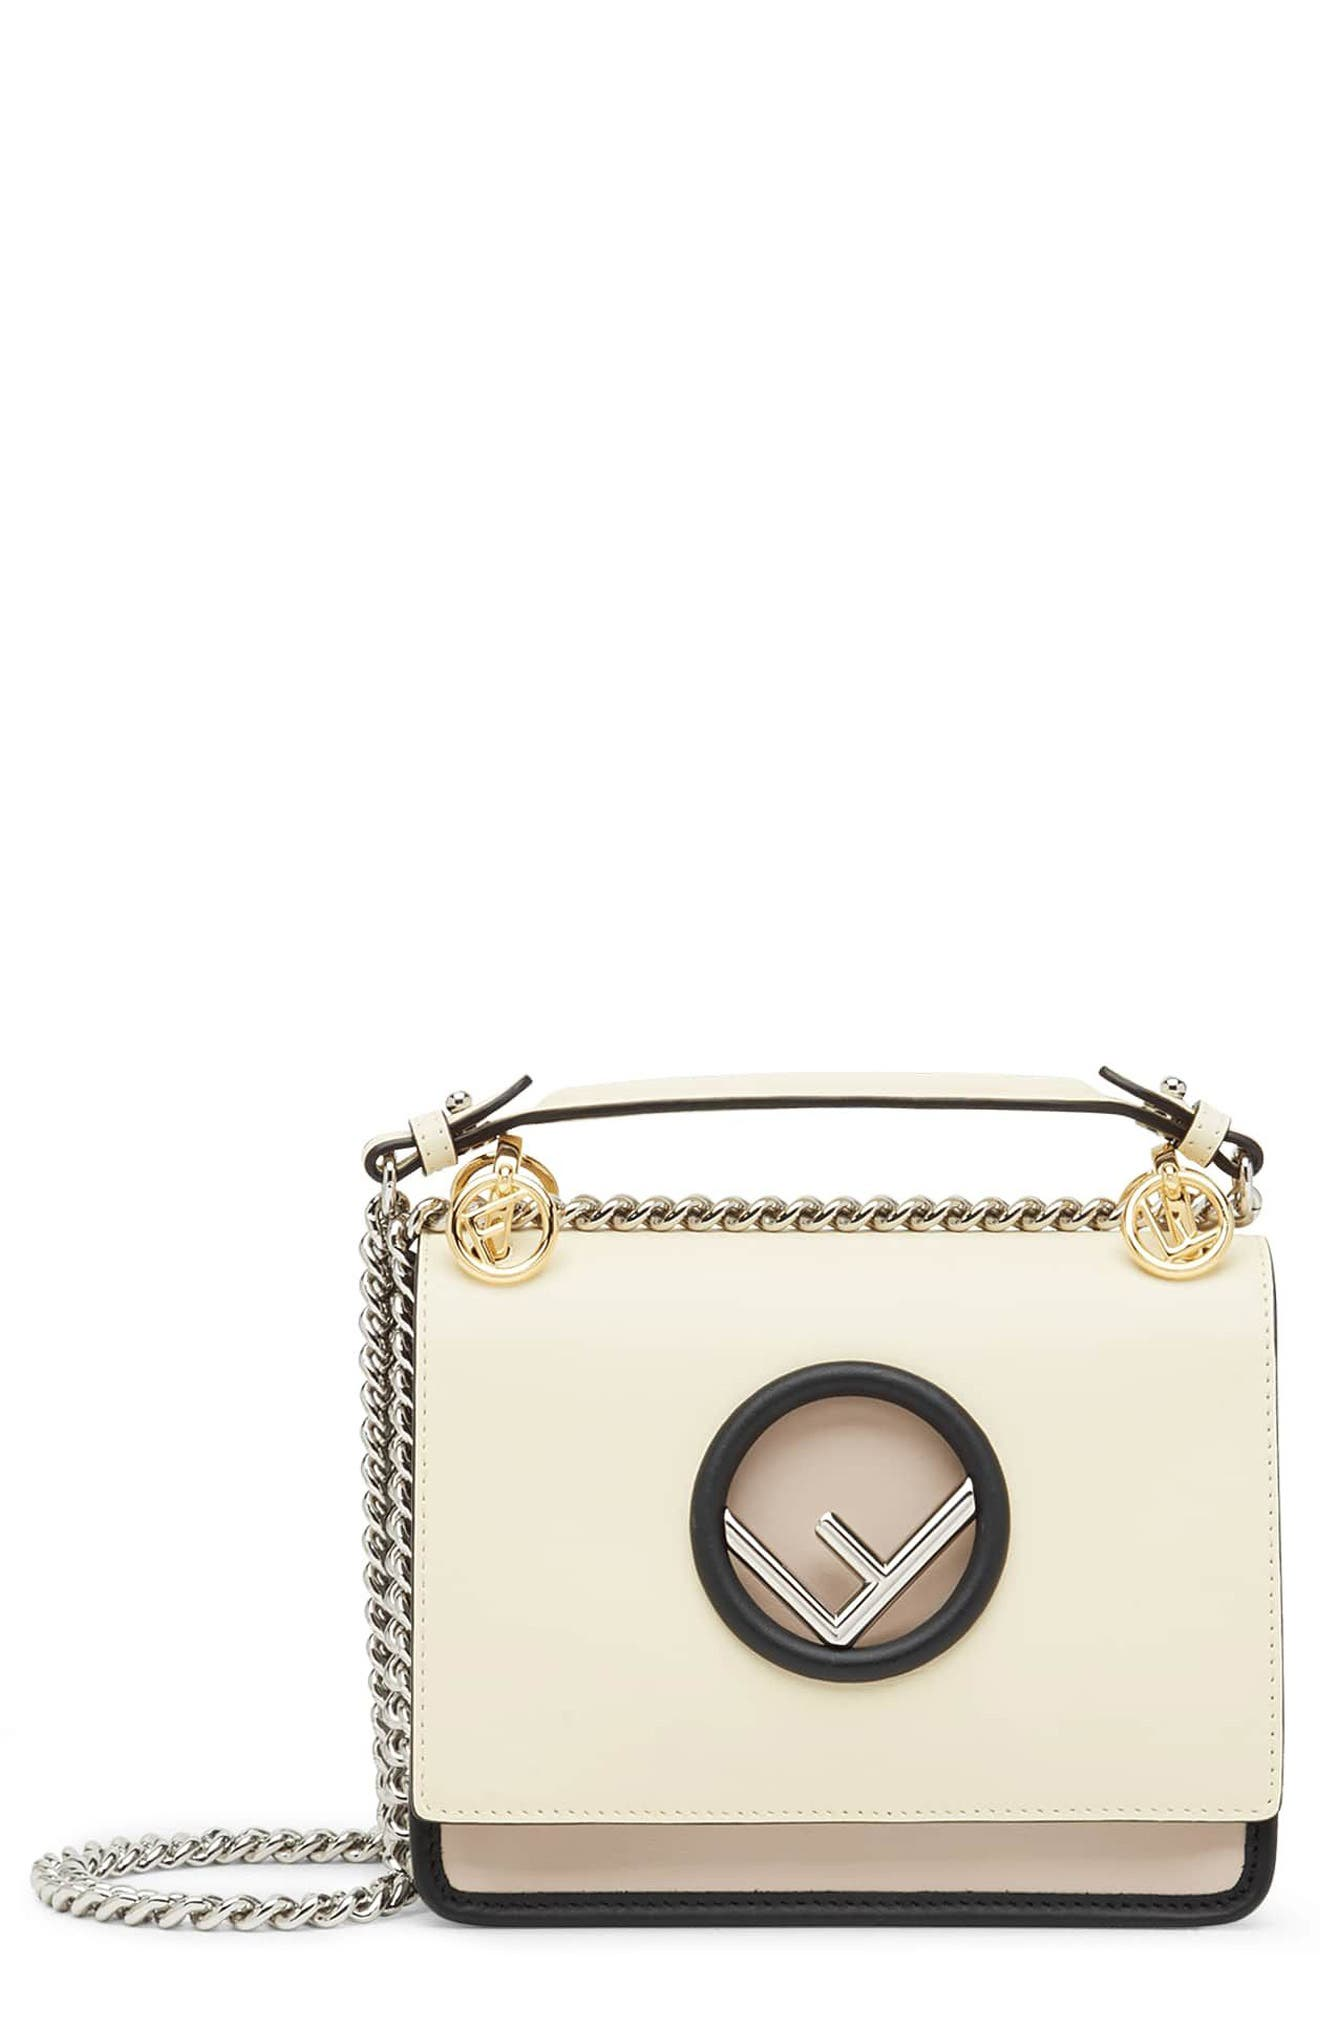 Mini Kan I Colorblock Leather Shoulder Bag,                         Main,                         color, 650